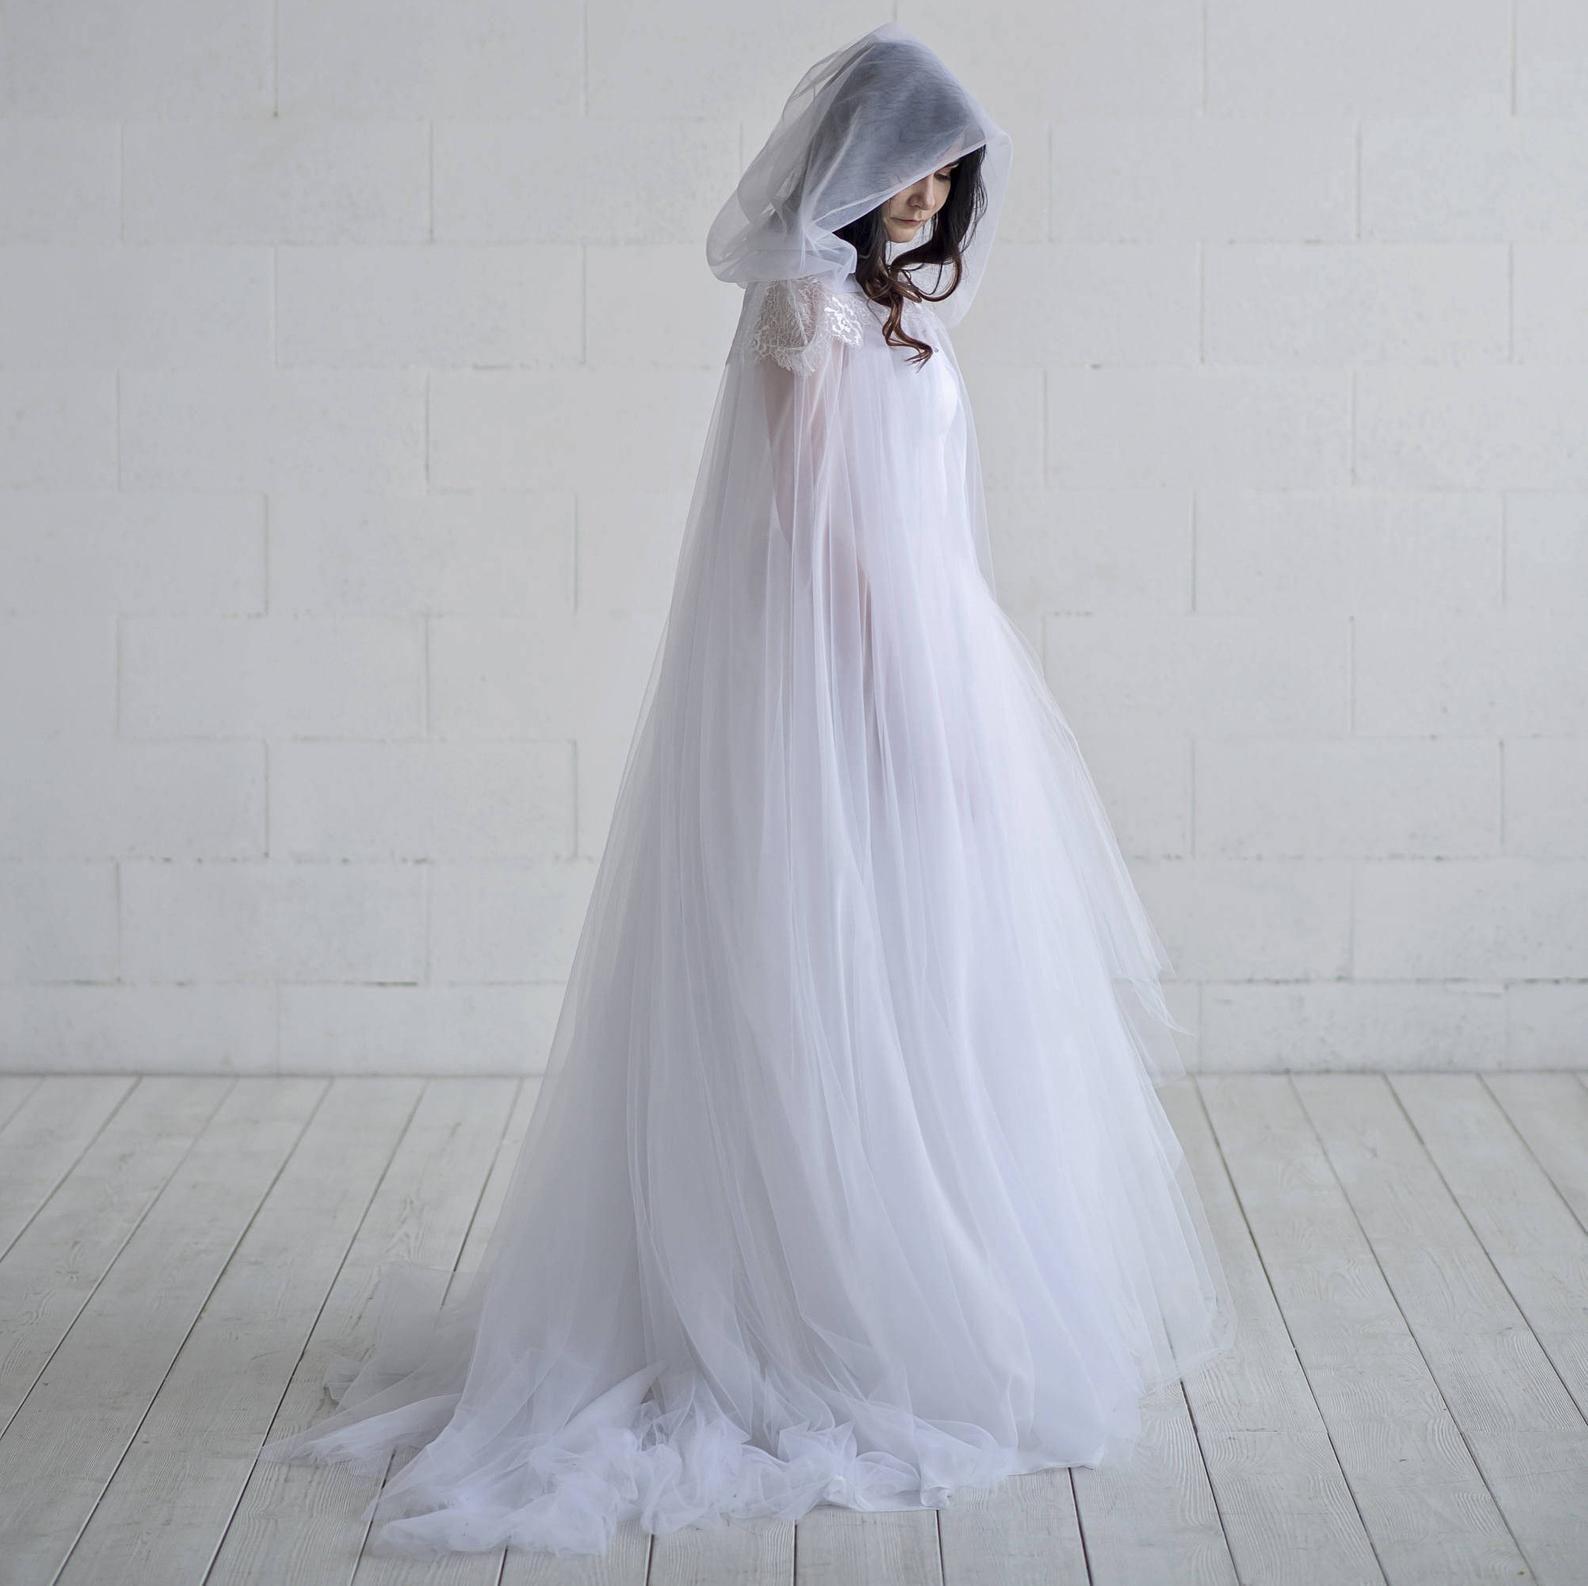 Ethereal Bridal Cloak Wedding Cape Bridal Cape Tulle Etsy Wedding Cloak Wedding Dresses Bridal Cape